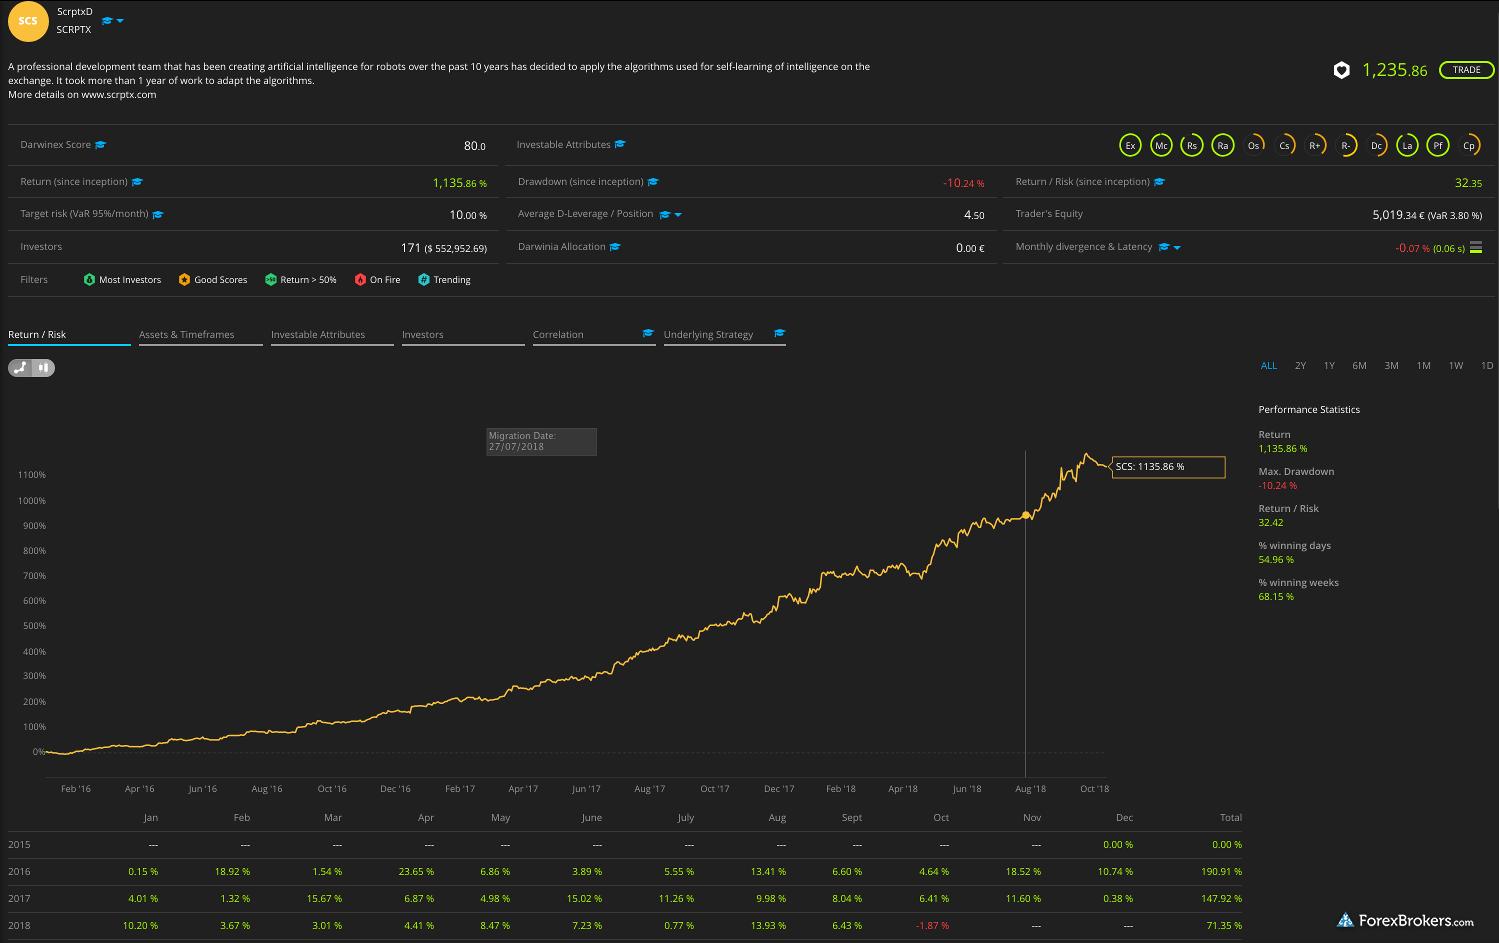 Darwinex web platform darwin performance